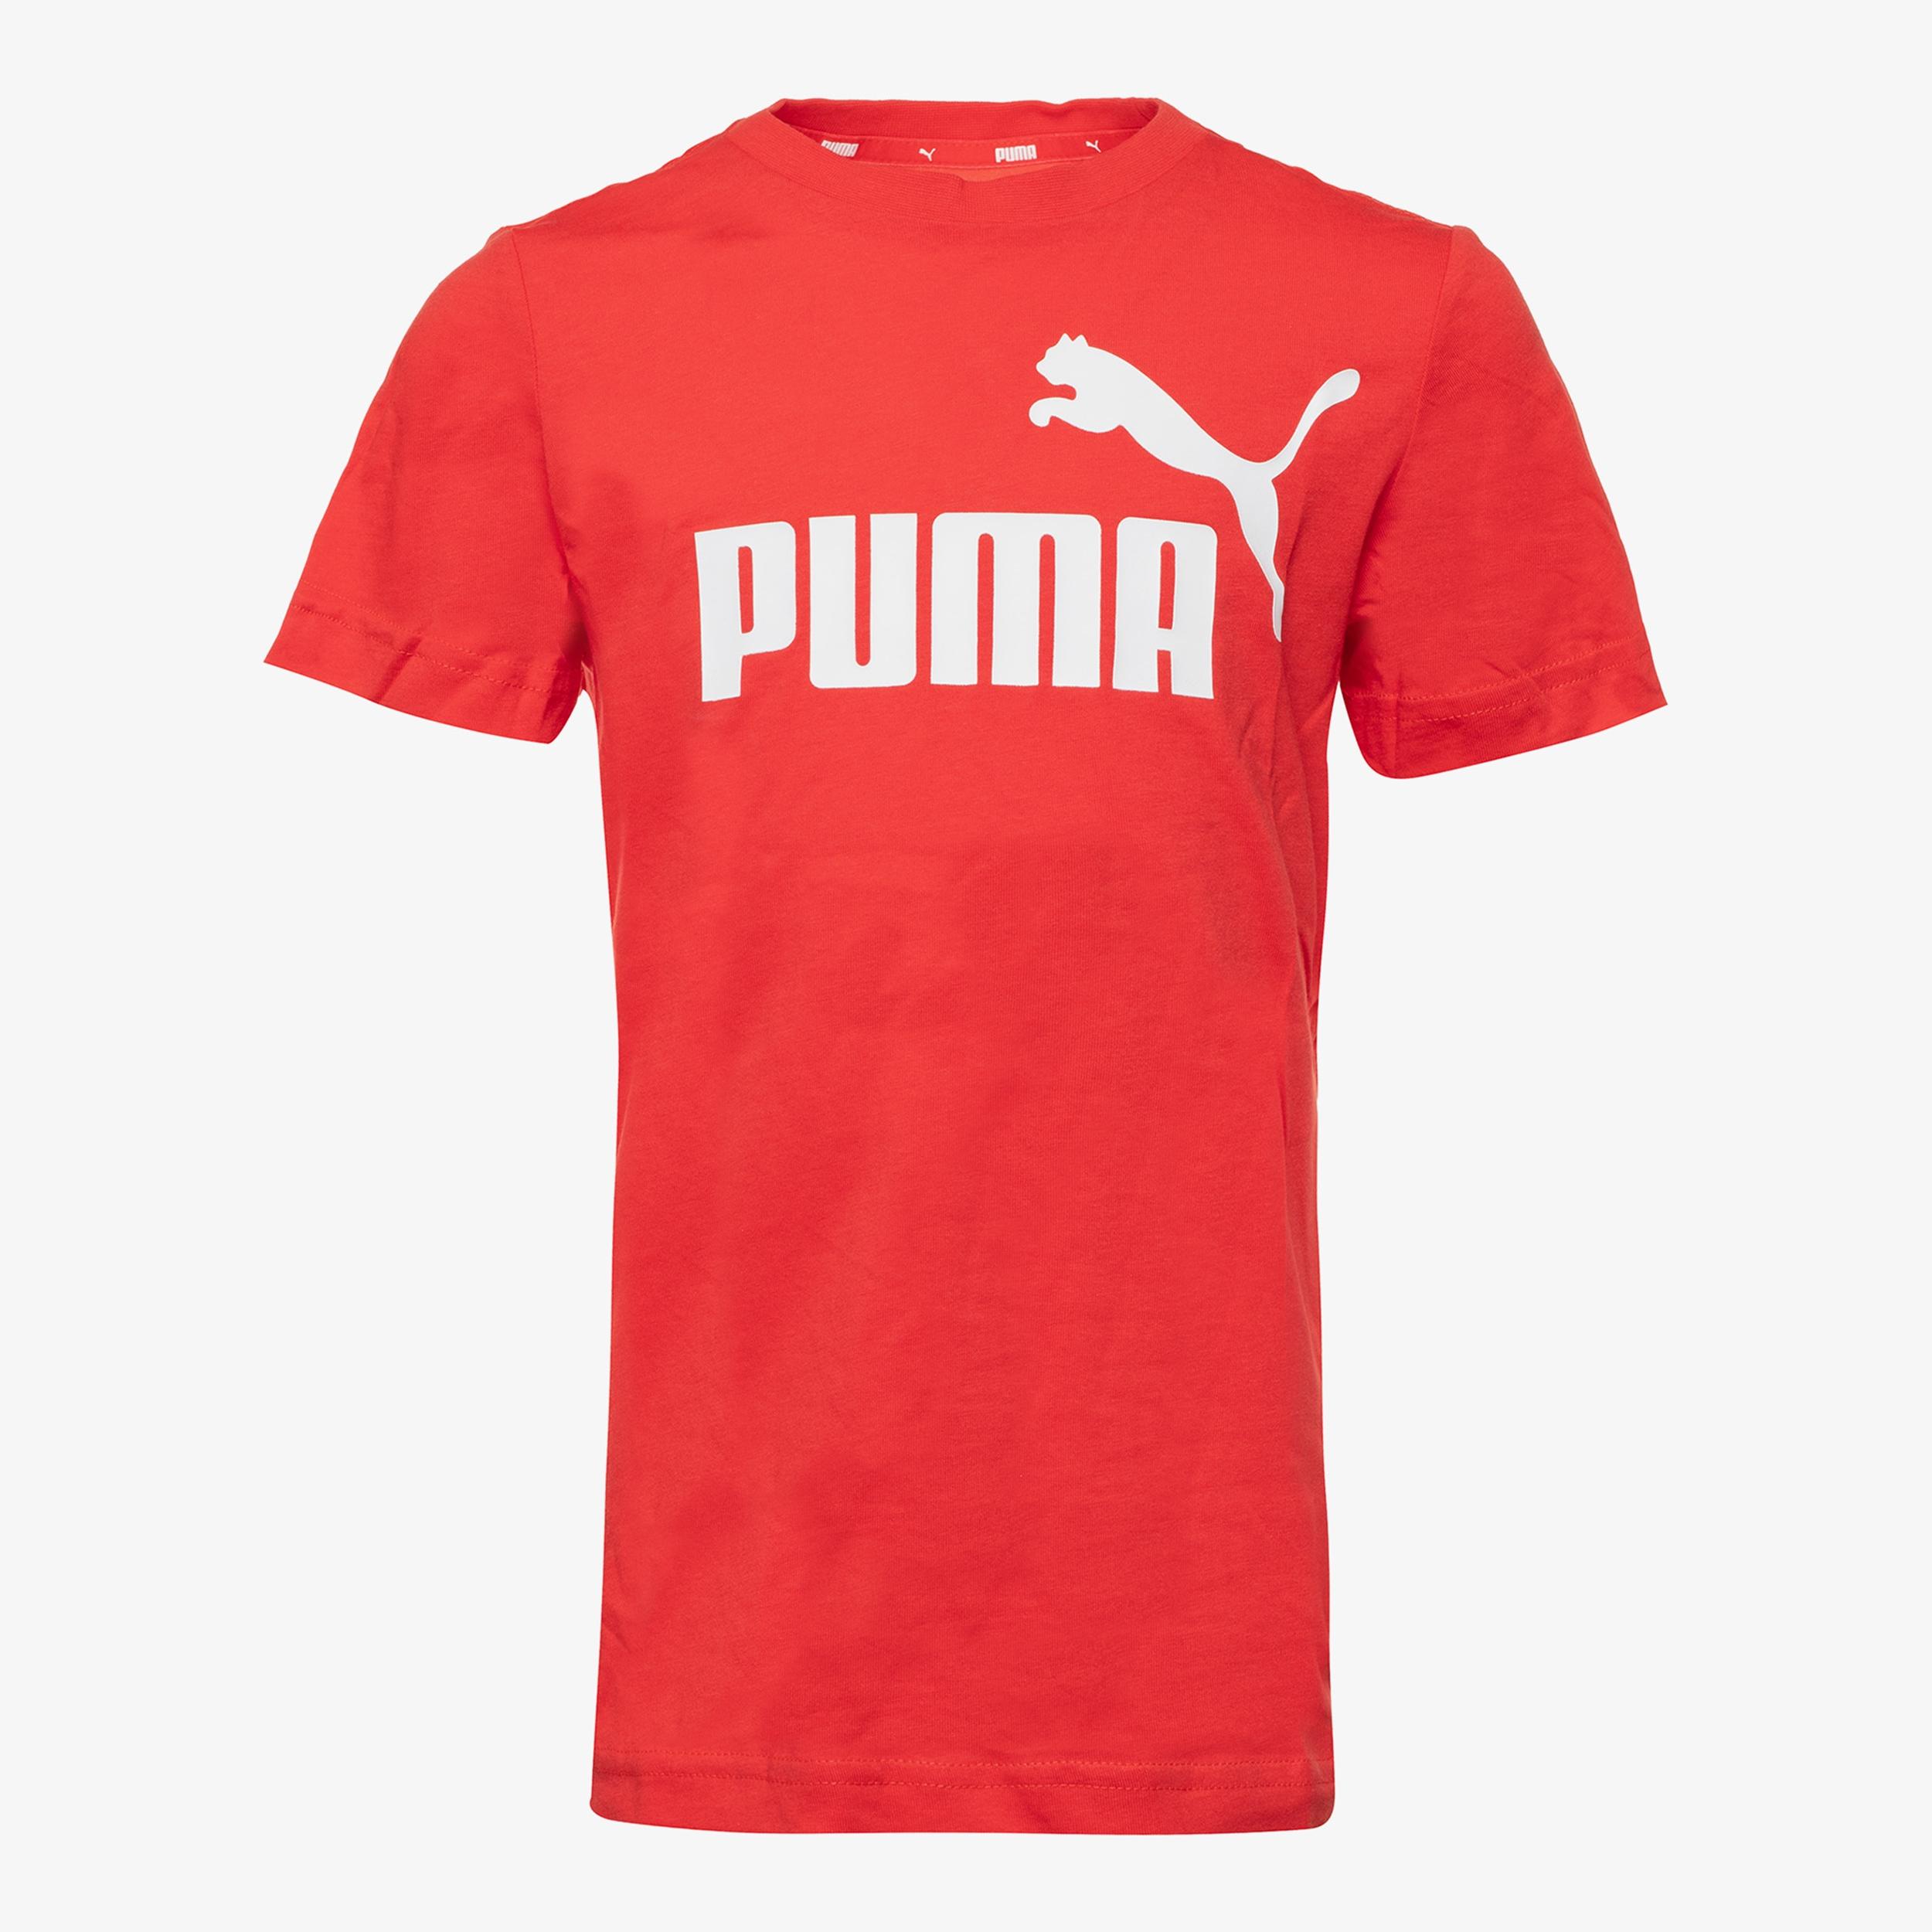 Puma Essential kinder sport t shirt | Scapino.nl